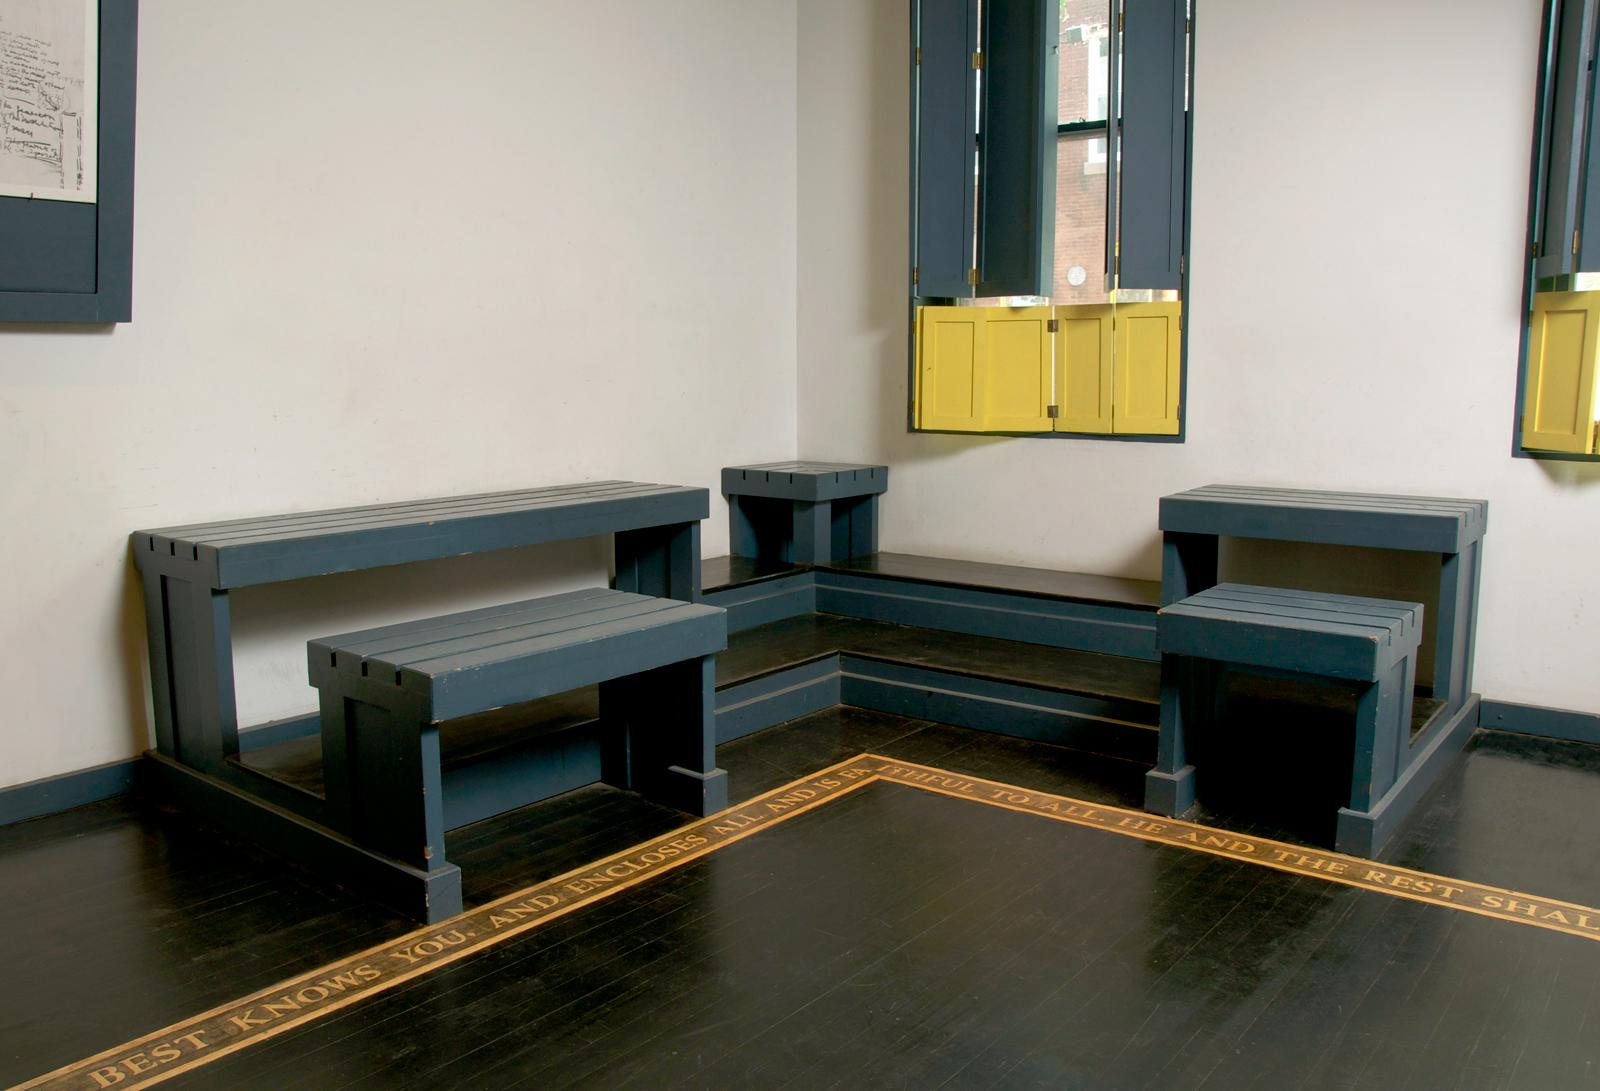 Louis Kahn Lecture Room